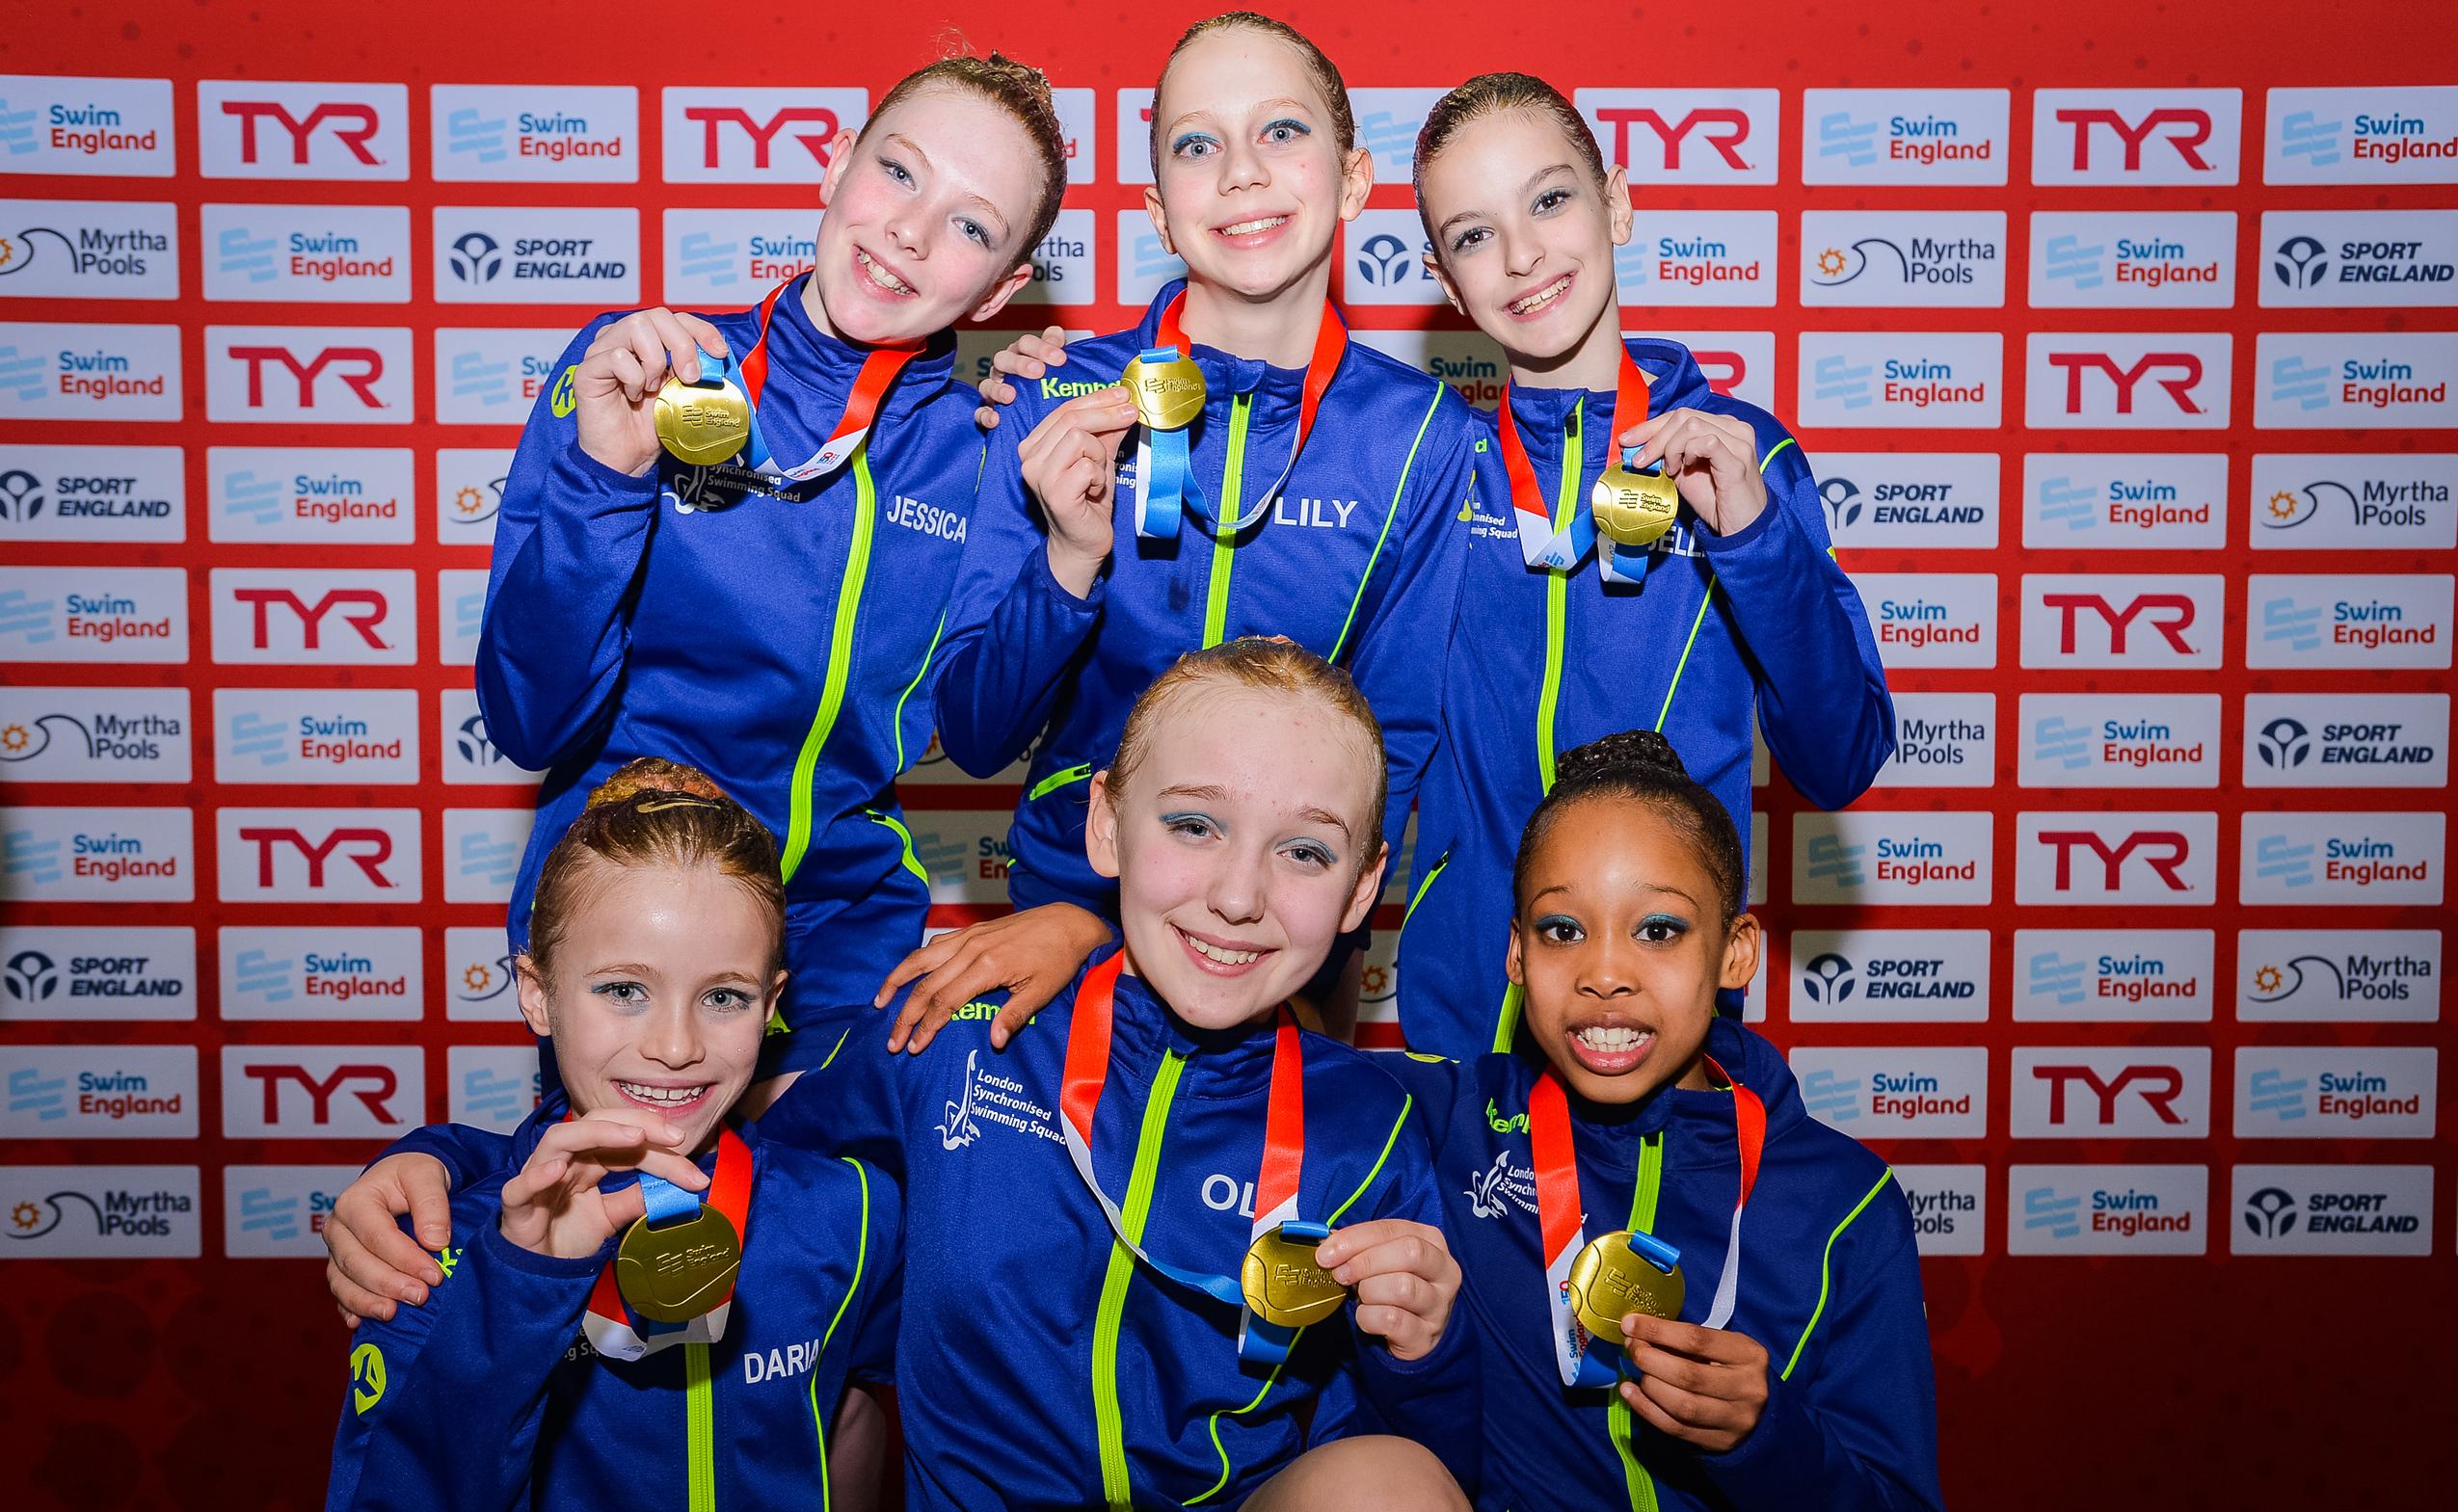 Swim England Synchro - Swim England National Age Group Championships 2019 at Manchester Aquatics Centre